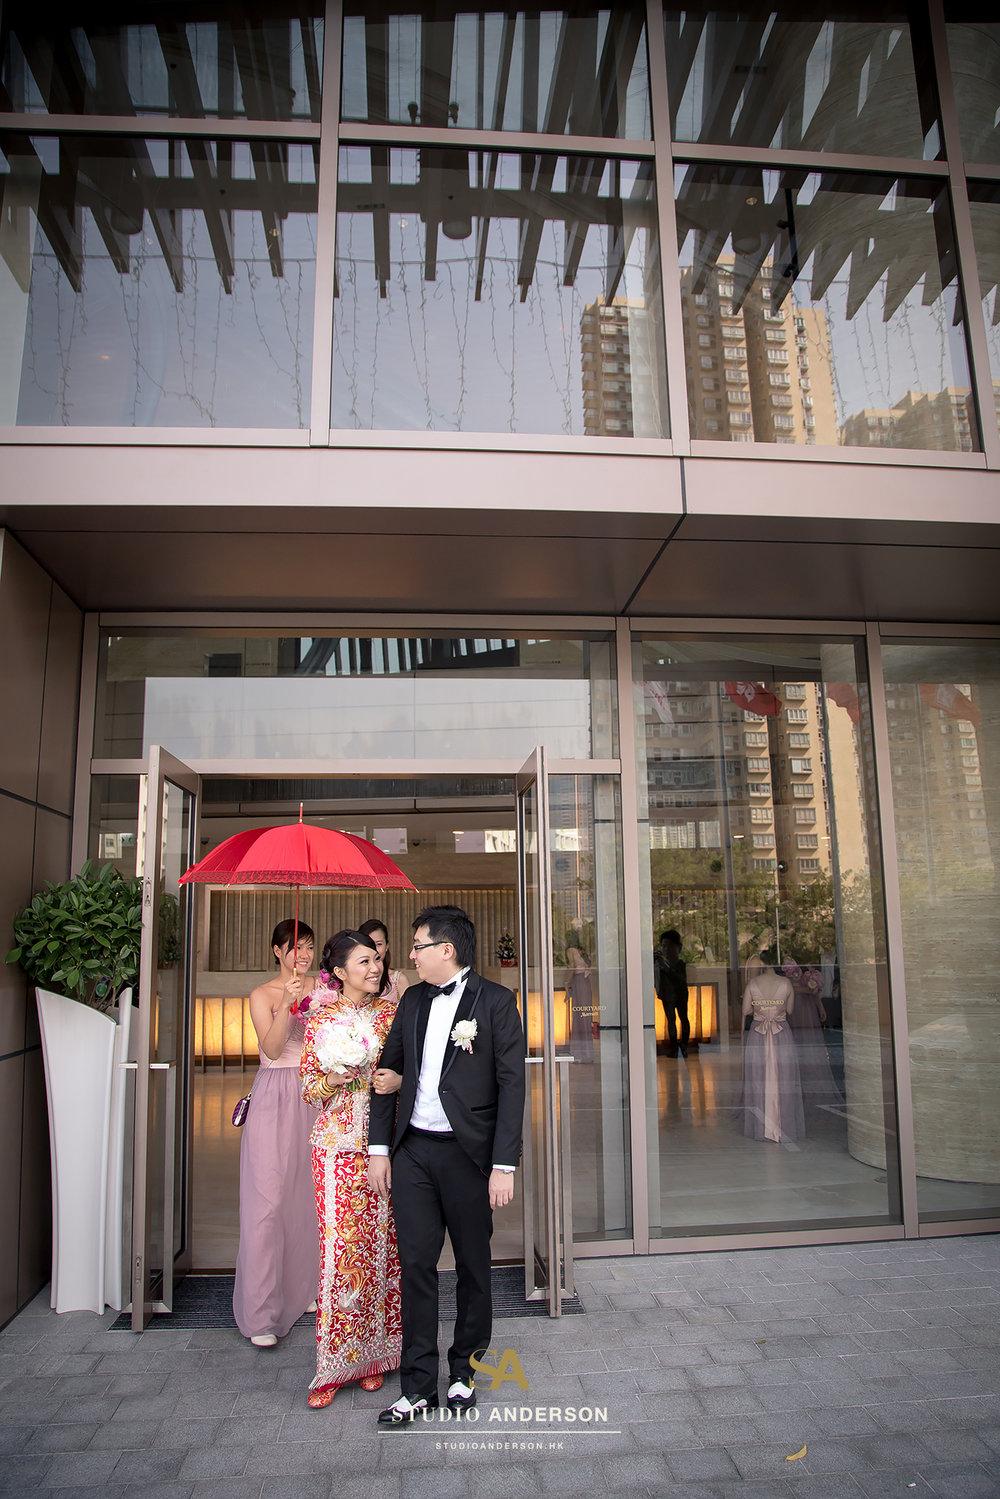 0511 - LT wedding.jpg